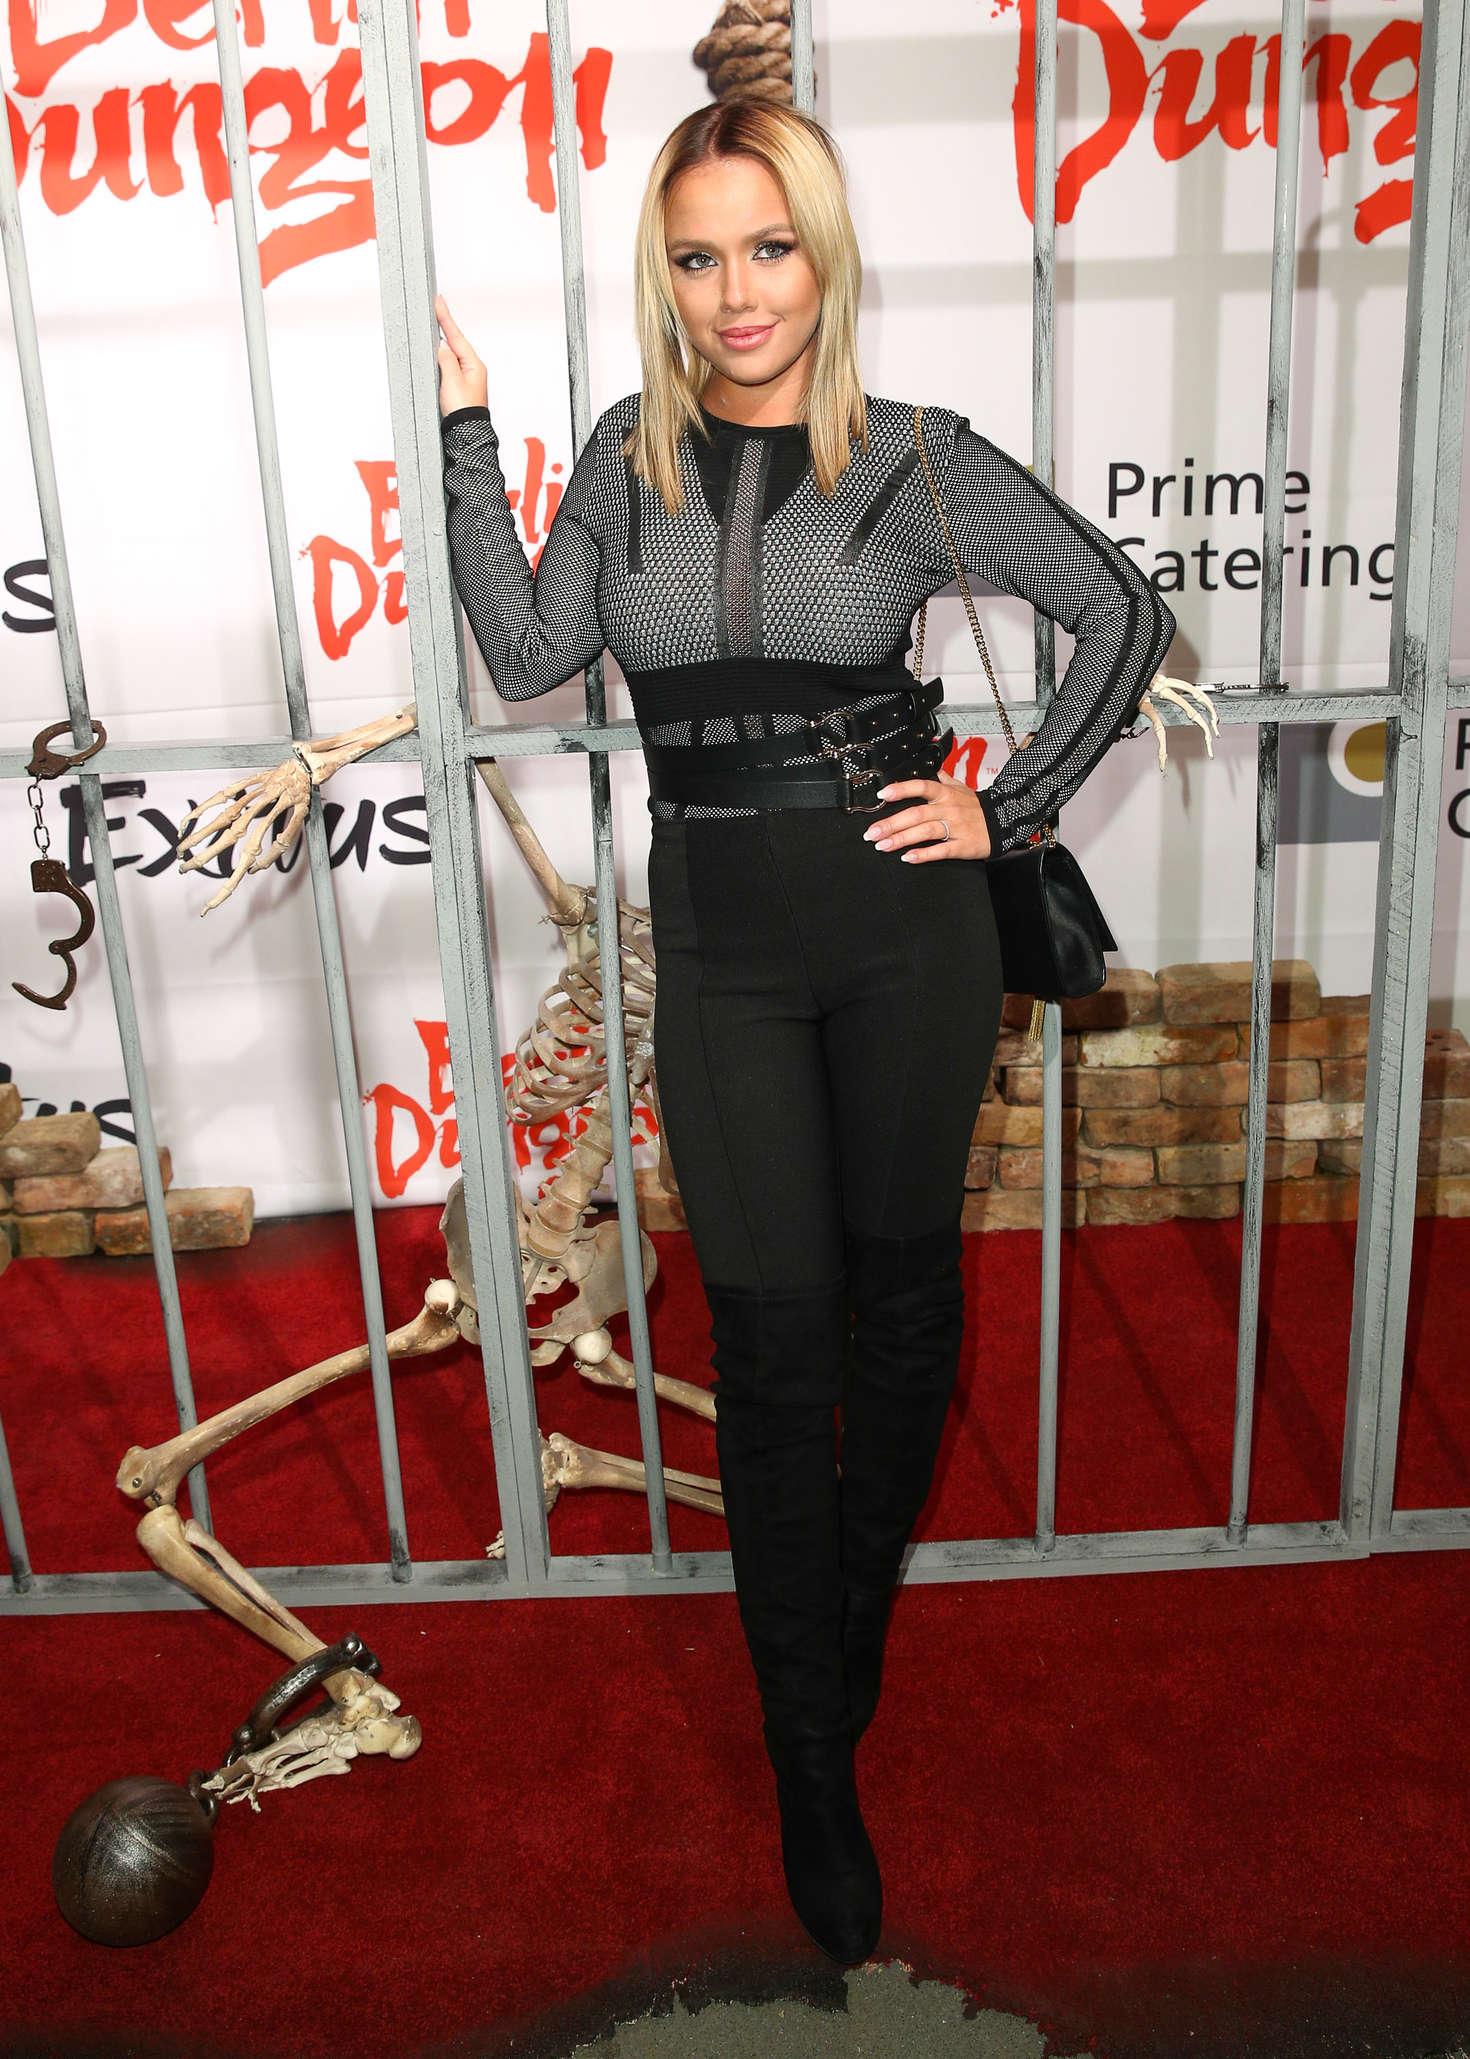 Kim Gloss EXITUS Premiere at Berlin Dungeon in Berlin